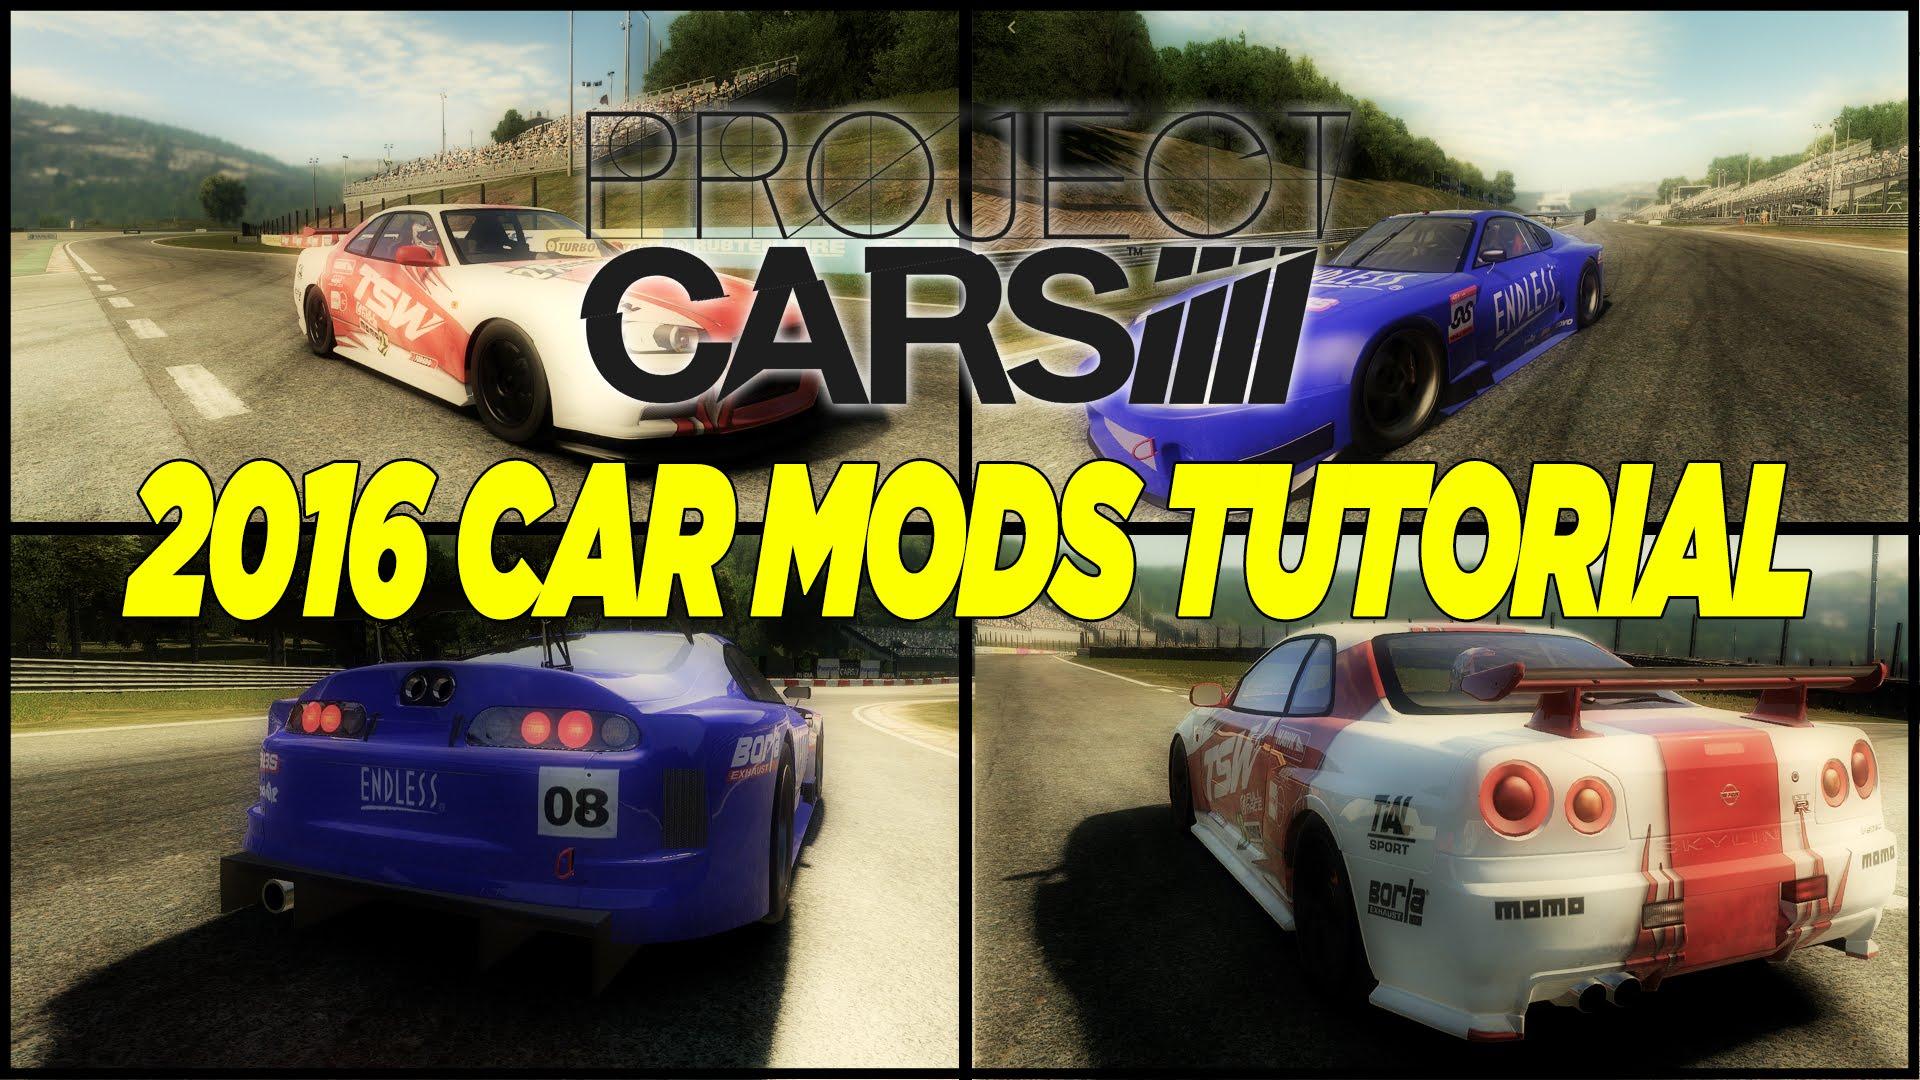 Modification car 1 photo